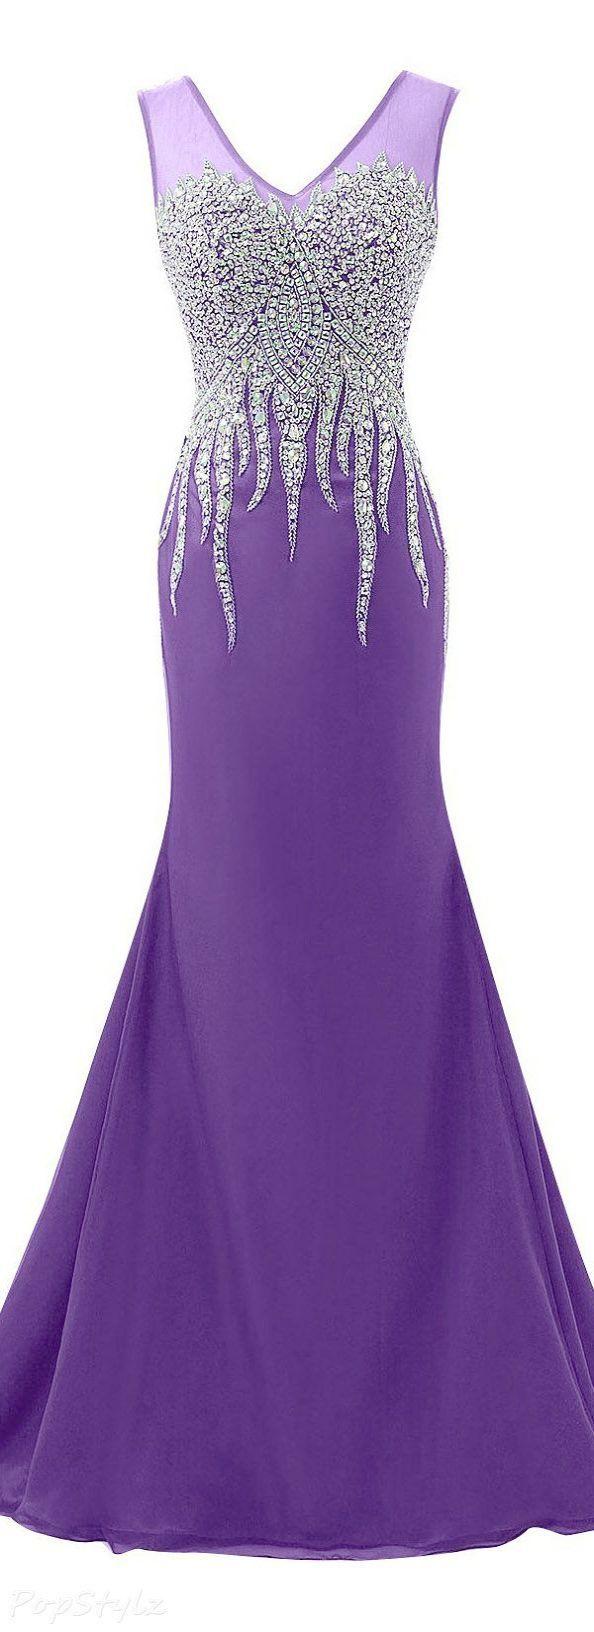 Evening Dress Kota Kinabalu Formal Gown Jacksonville Nc | Evening ...